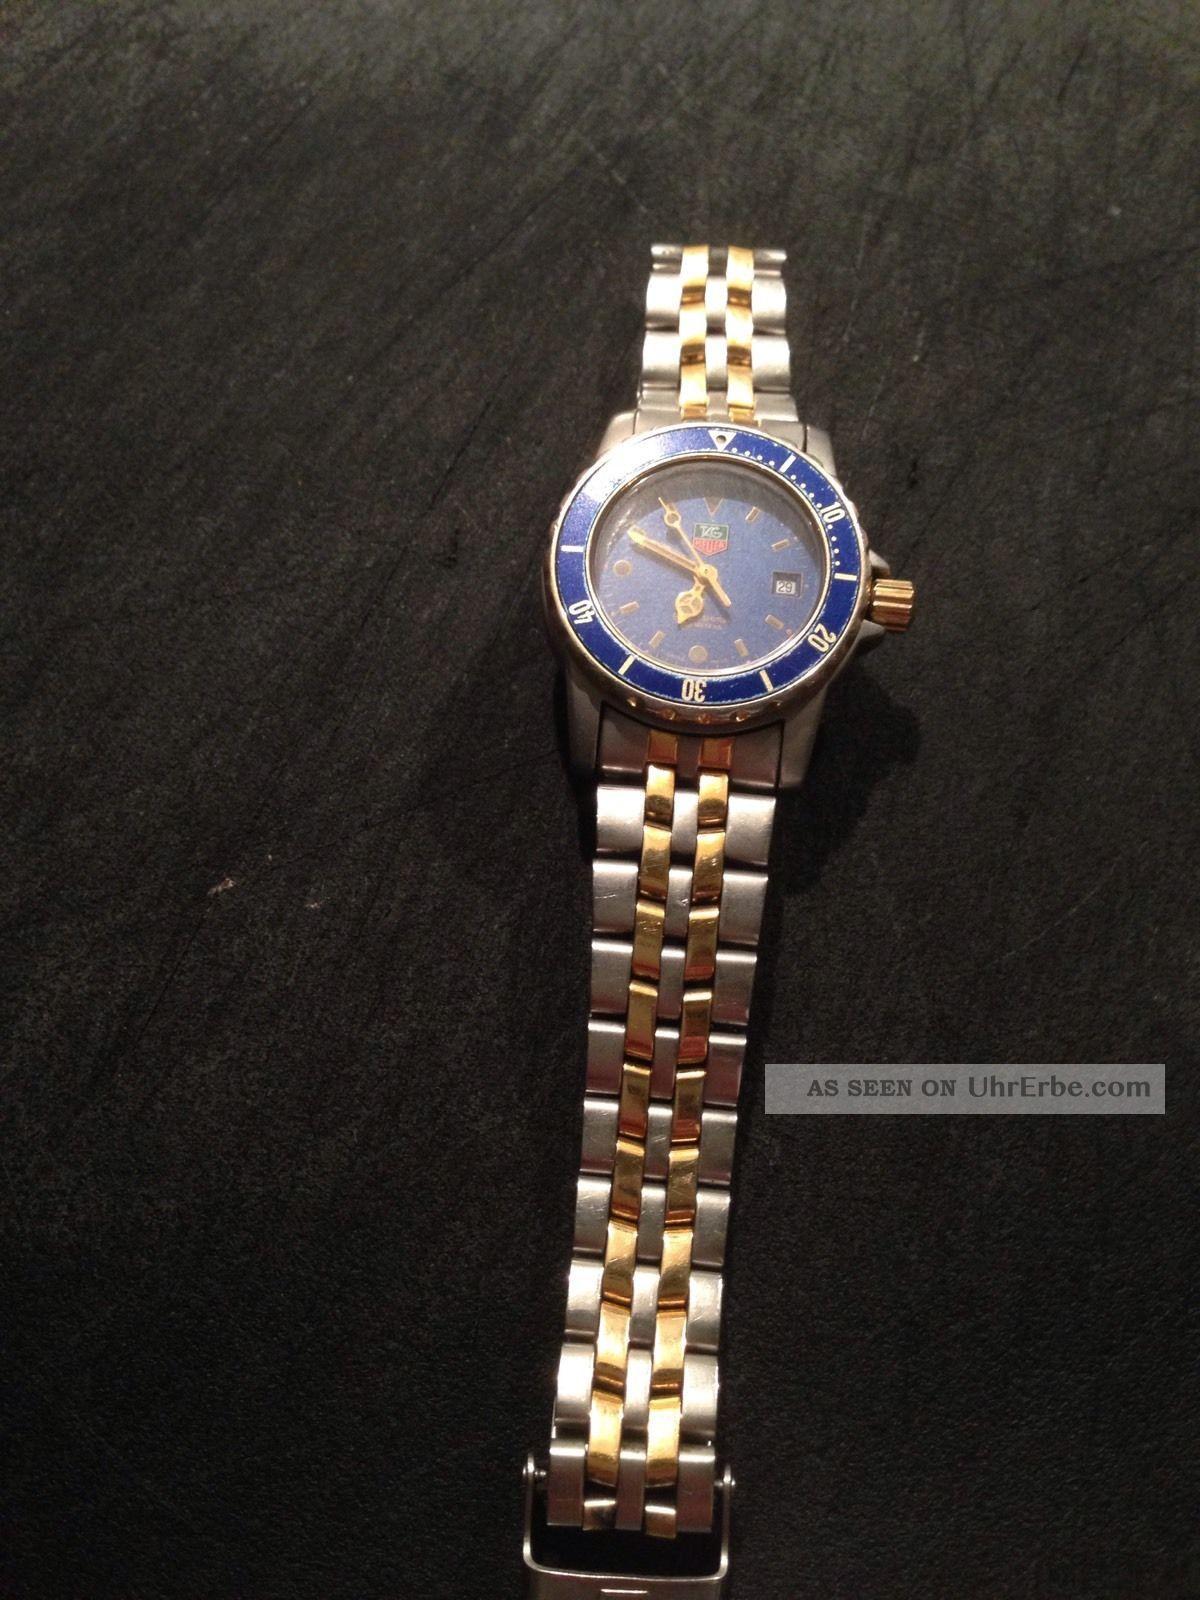 Tag Heuer Link Link Armbanduhr Für Damen (wj131cba0573) Armbanduhren Bild